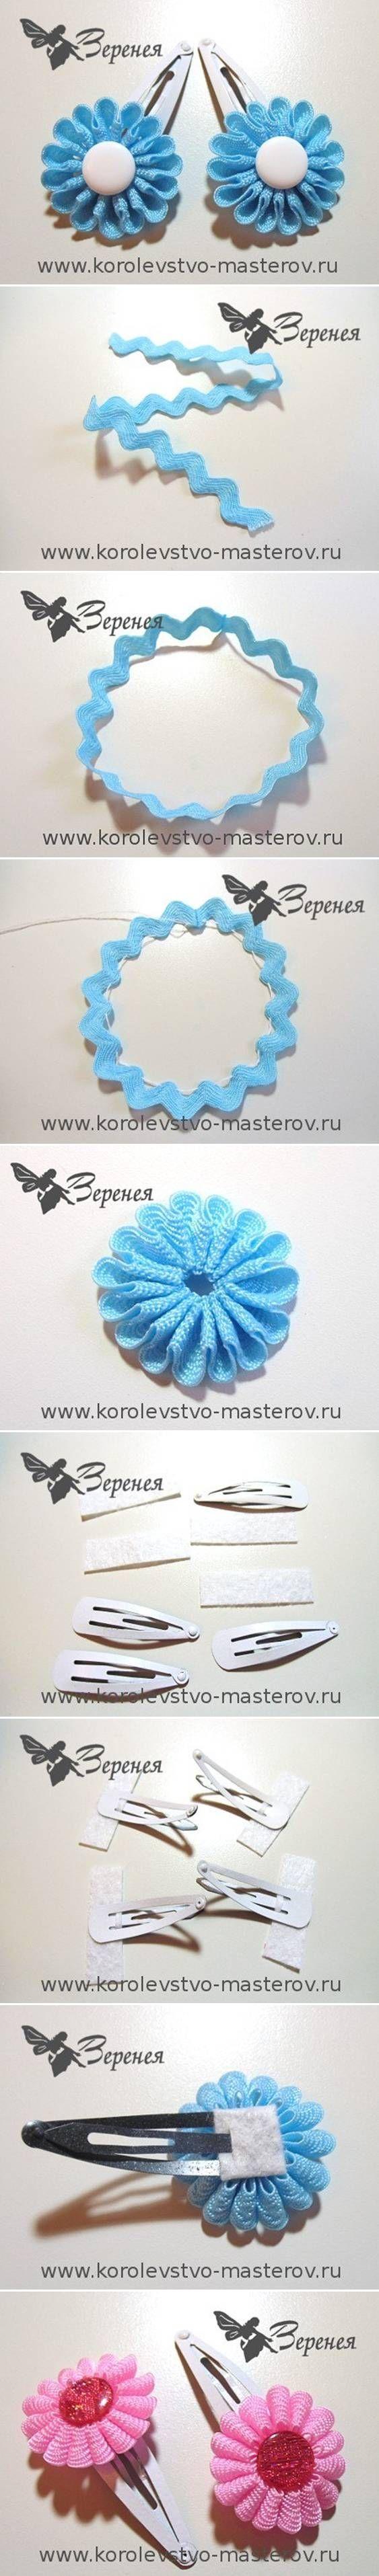 DIY Braid Flower DIY Braid Flower by diyforever